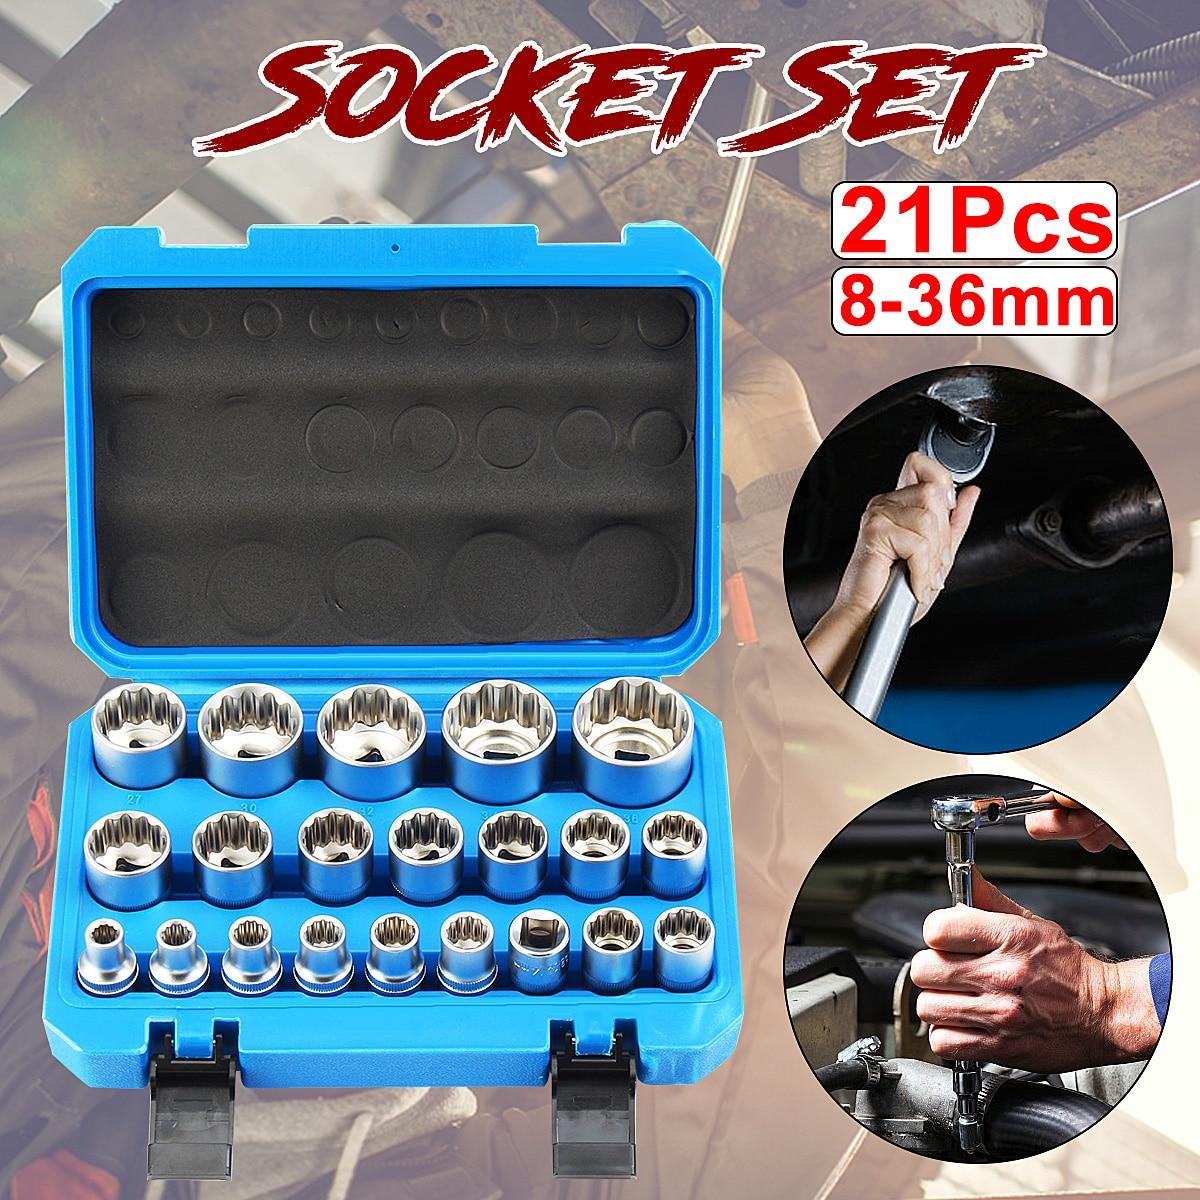 21Pcs 1/2 Inch Drive Shallow 12P Socket Set 8mm - 36mm Garage Workshop Tool21Pcs 1/2 Inch Drive Shallow 12P Socket Set 8mm - 36mm Garage Workshop Tool